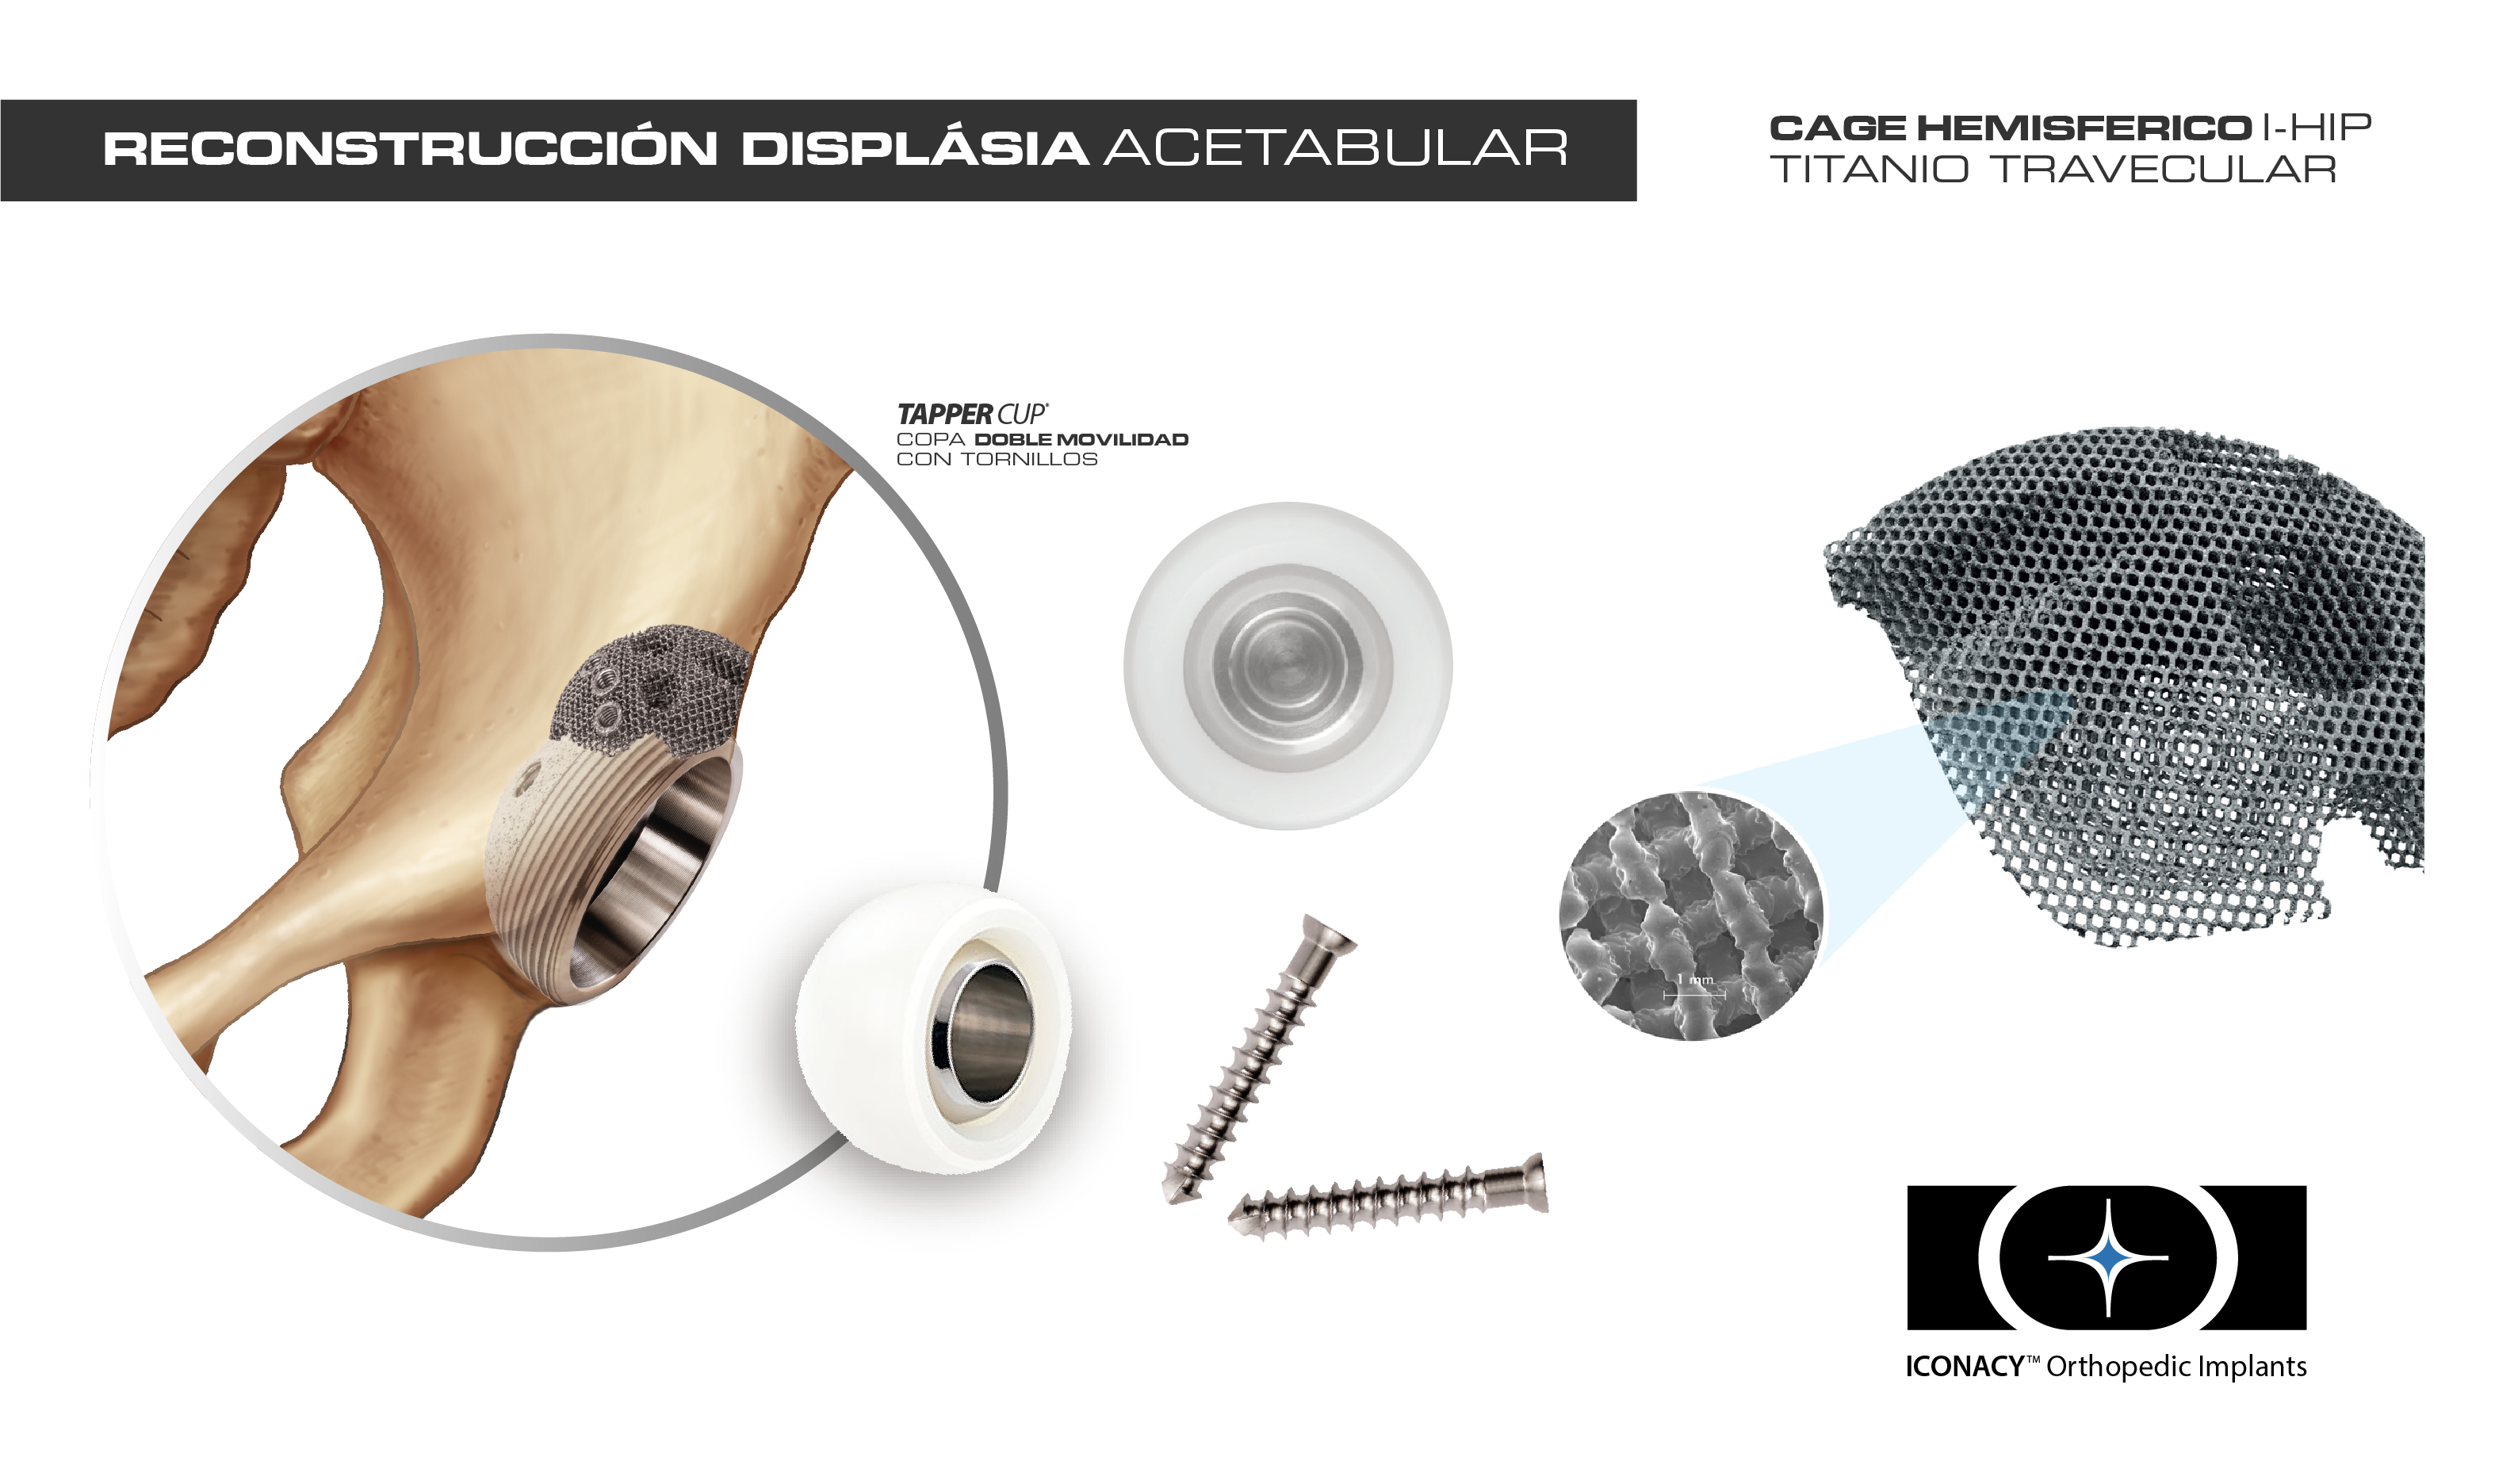 Sub menu Acetabulo displasico - Iconacy - Integrip-01